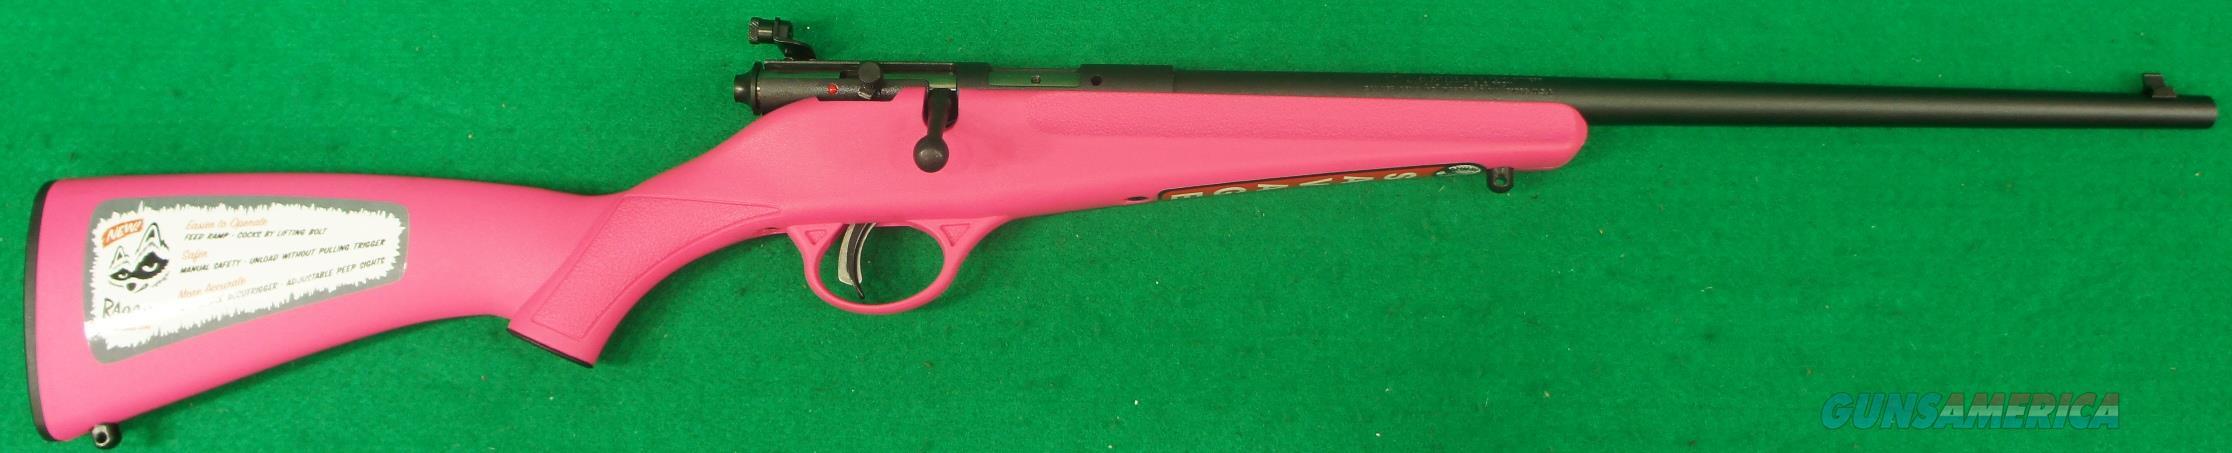 Rascal Youth Pink Single 22LR 16.1In  13780  Guns > Rifles > Savage Rifles > Accutrigger Models > Sporting